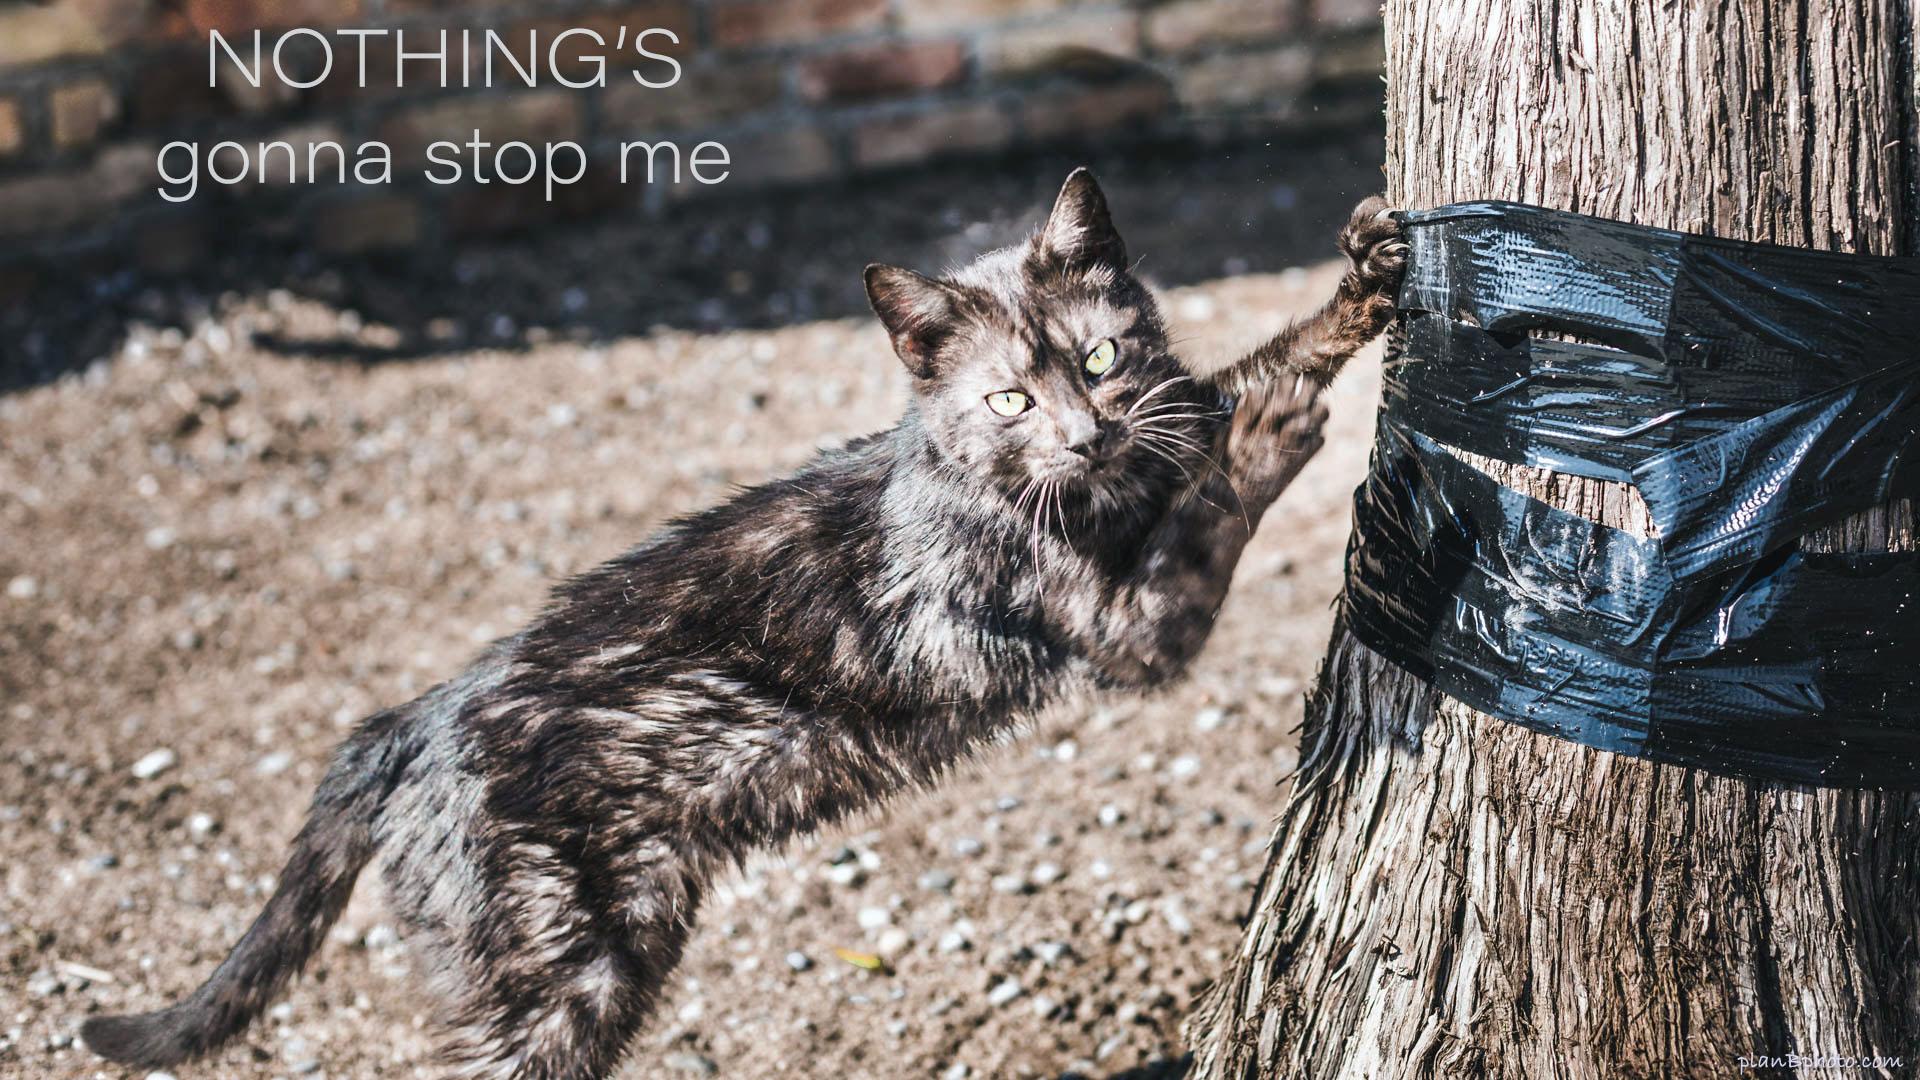 Dark cat scratching a tree